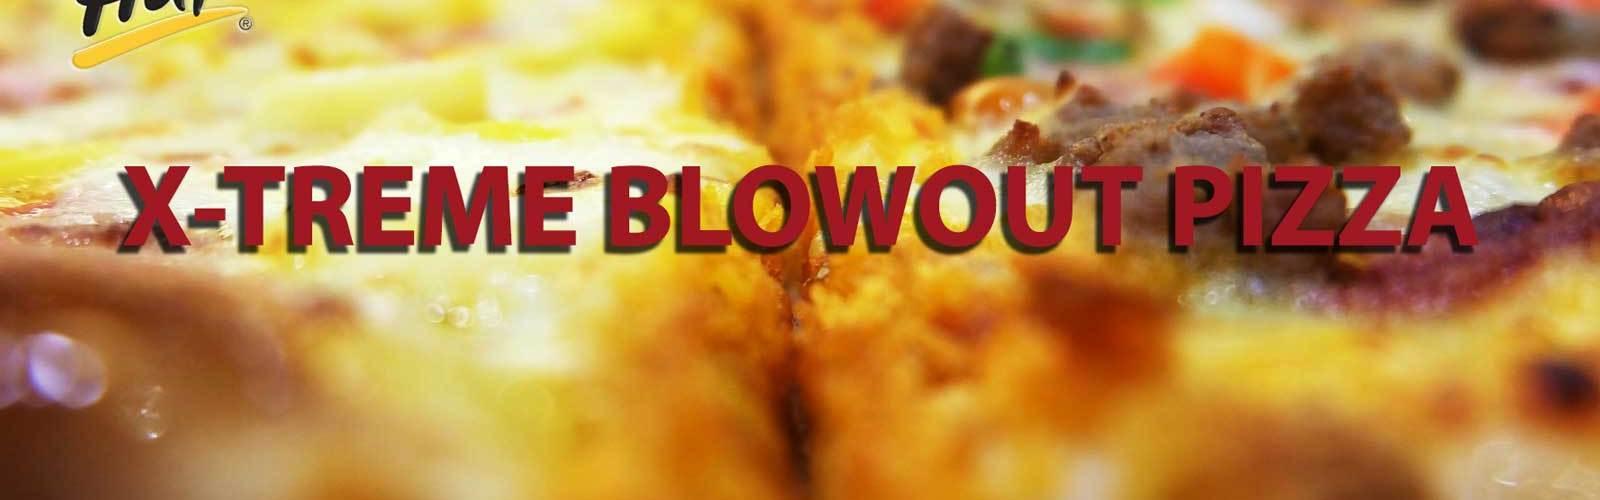 Xtreme blowout pizza